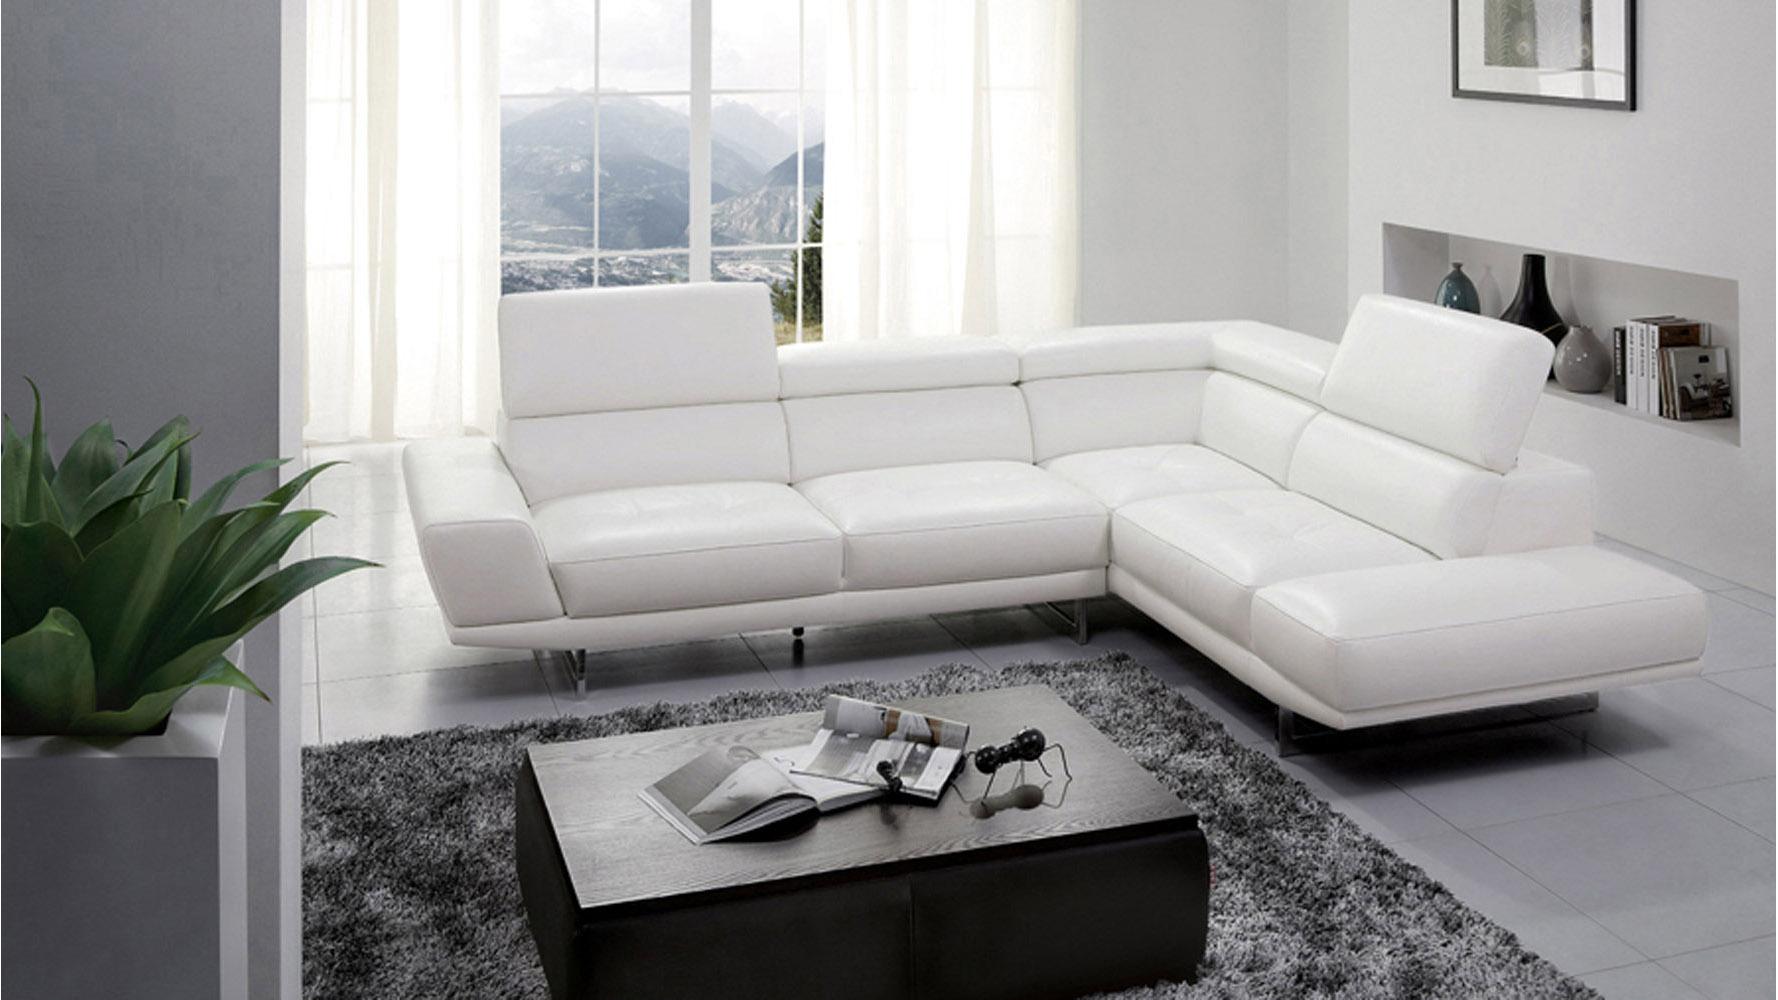 Posh White Top Grain Leather Modern Corner Sectional Sofa